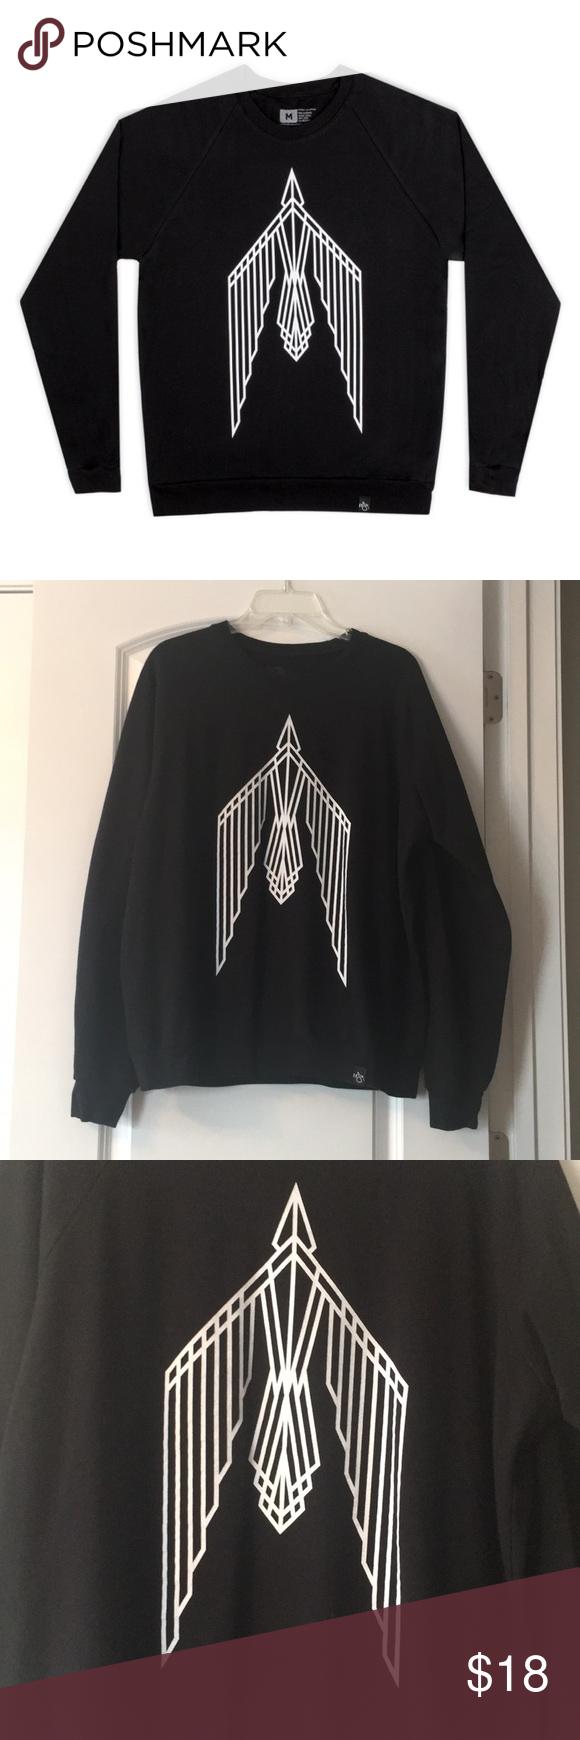 Black And White Sweatshirt Black Sweatshirt Outfit Sweatshirts White Sweatshirt [ 1740 x 580 Pixel ]